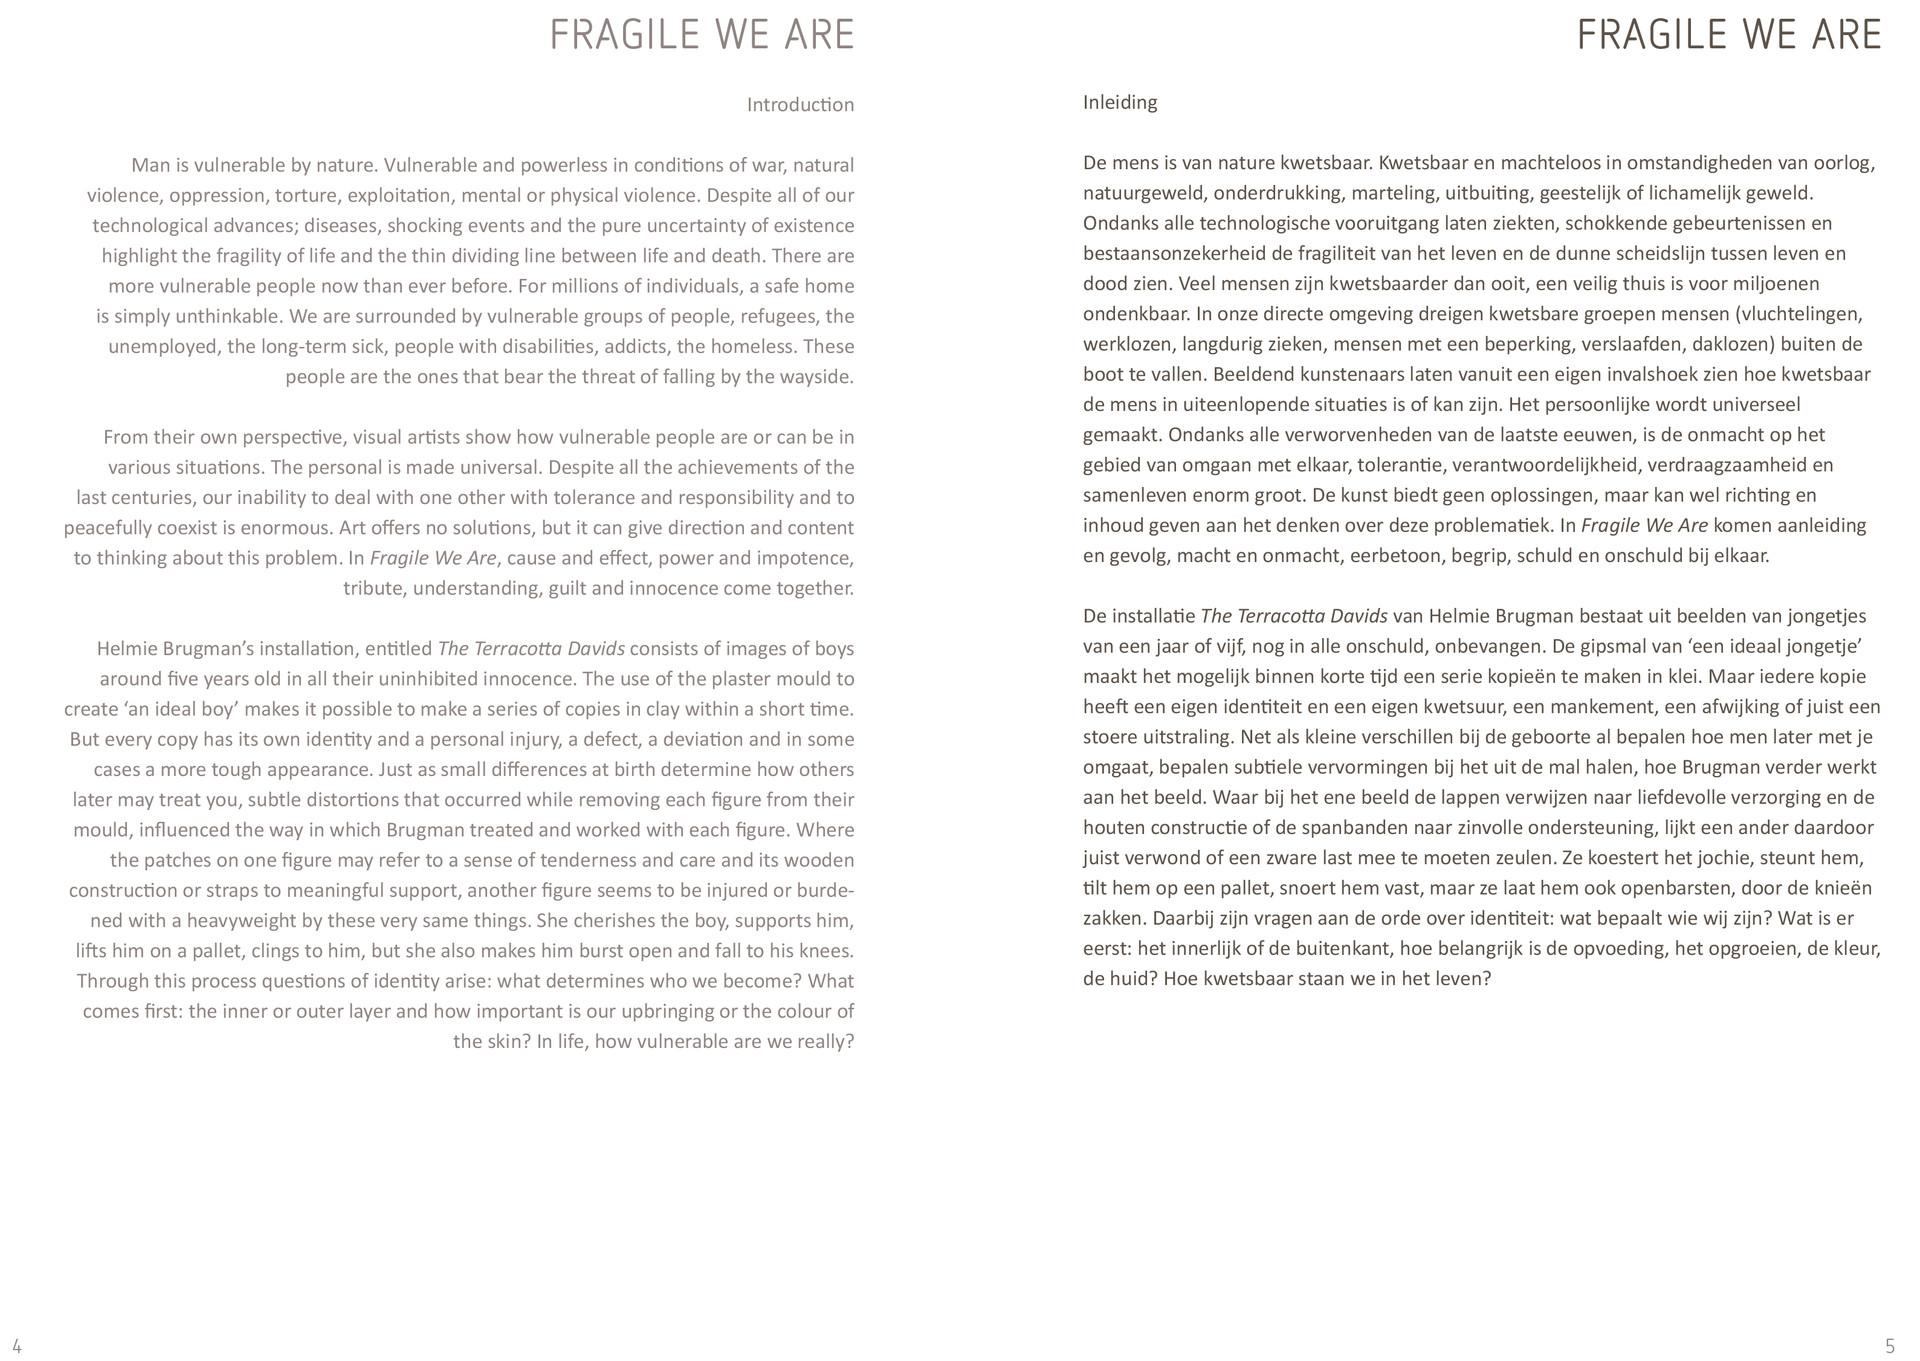 2-Fragile We Are boekje.jpg